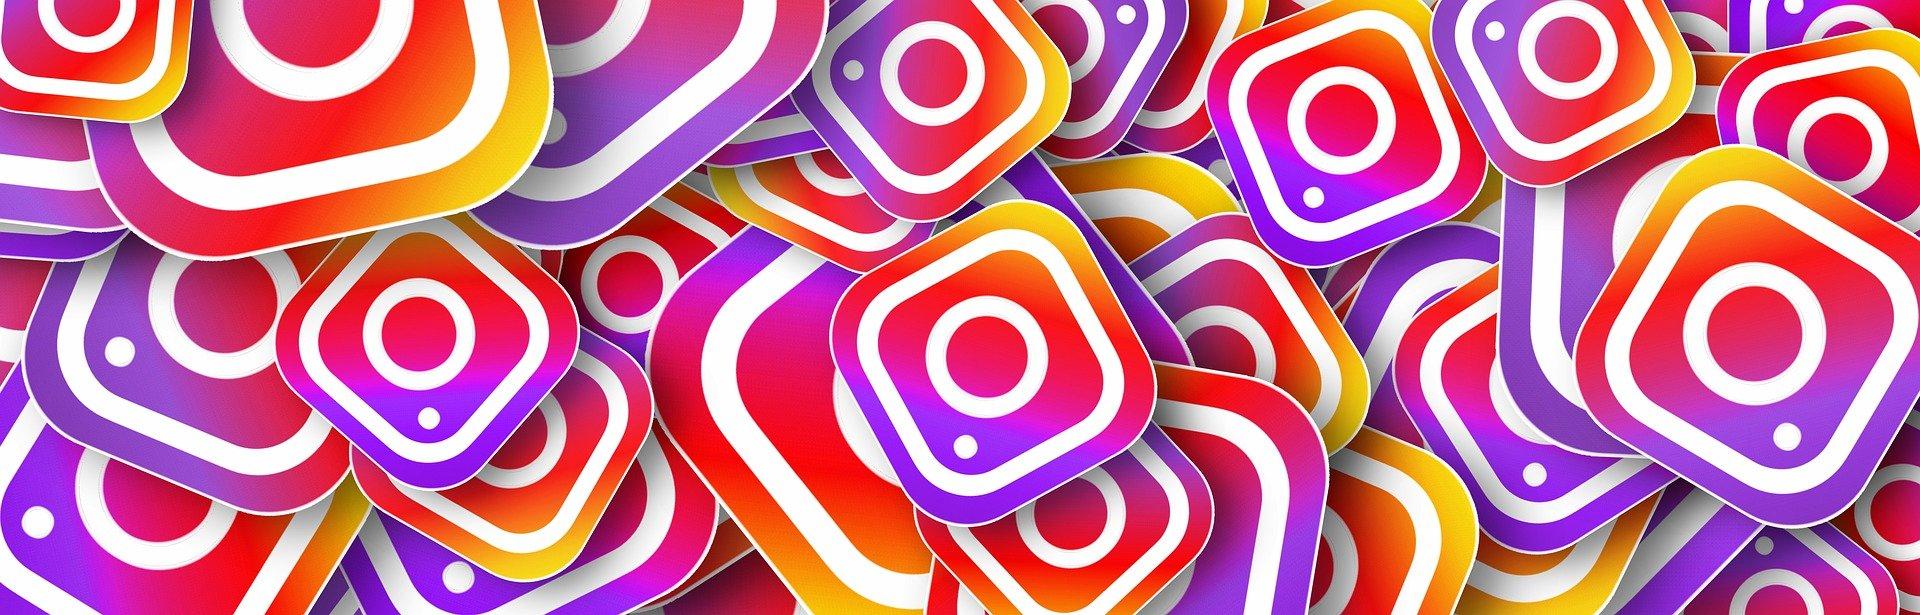 Redes sociales difadi.com